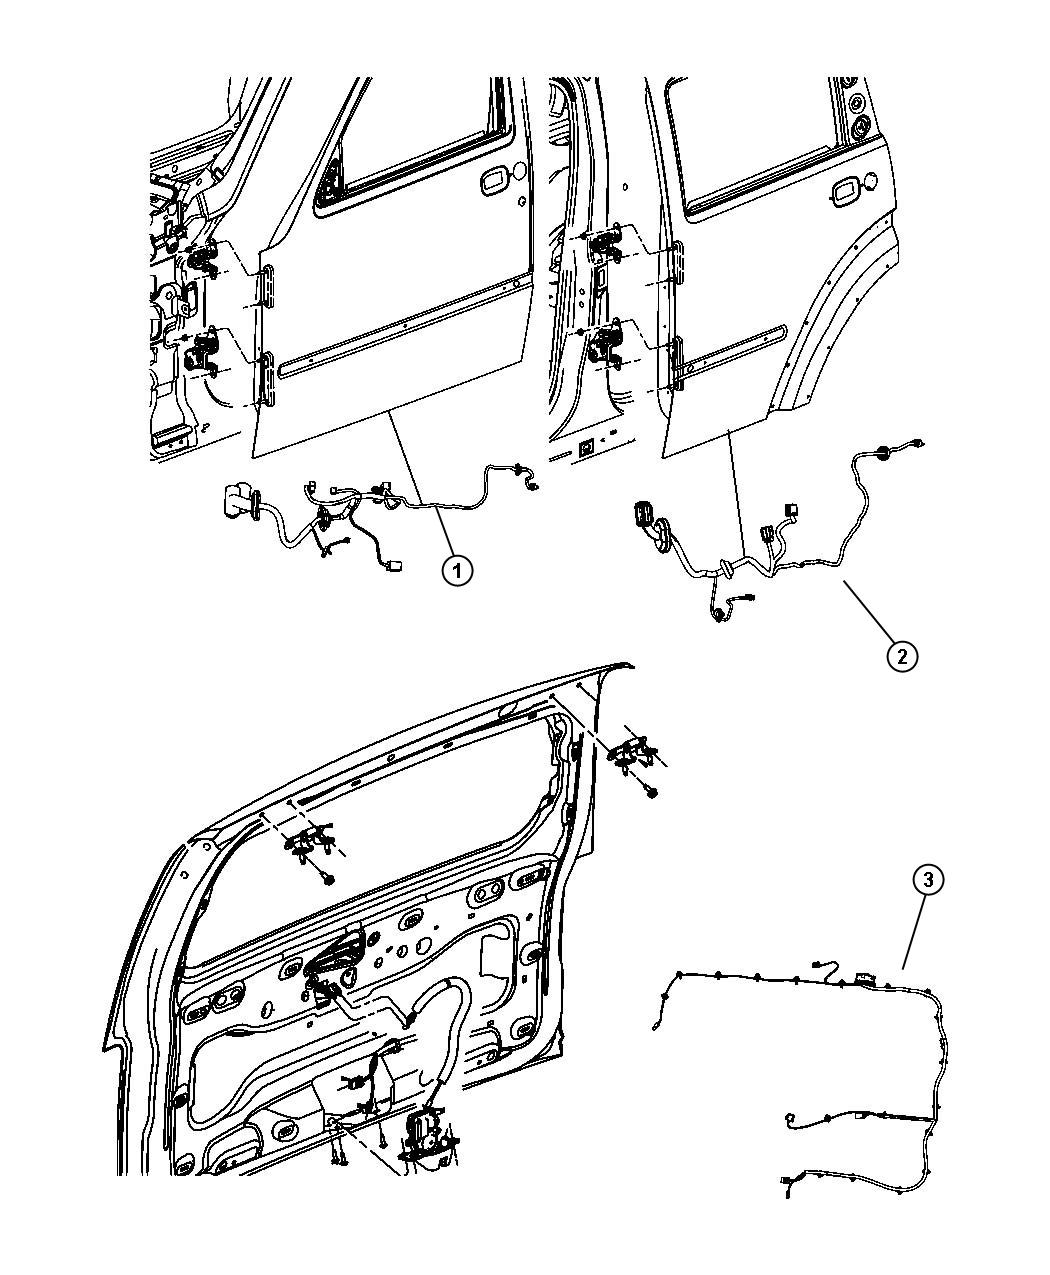 wiring diagram jeeppass 2018 espaol